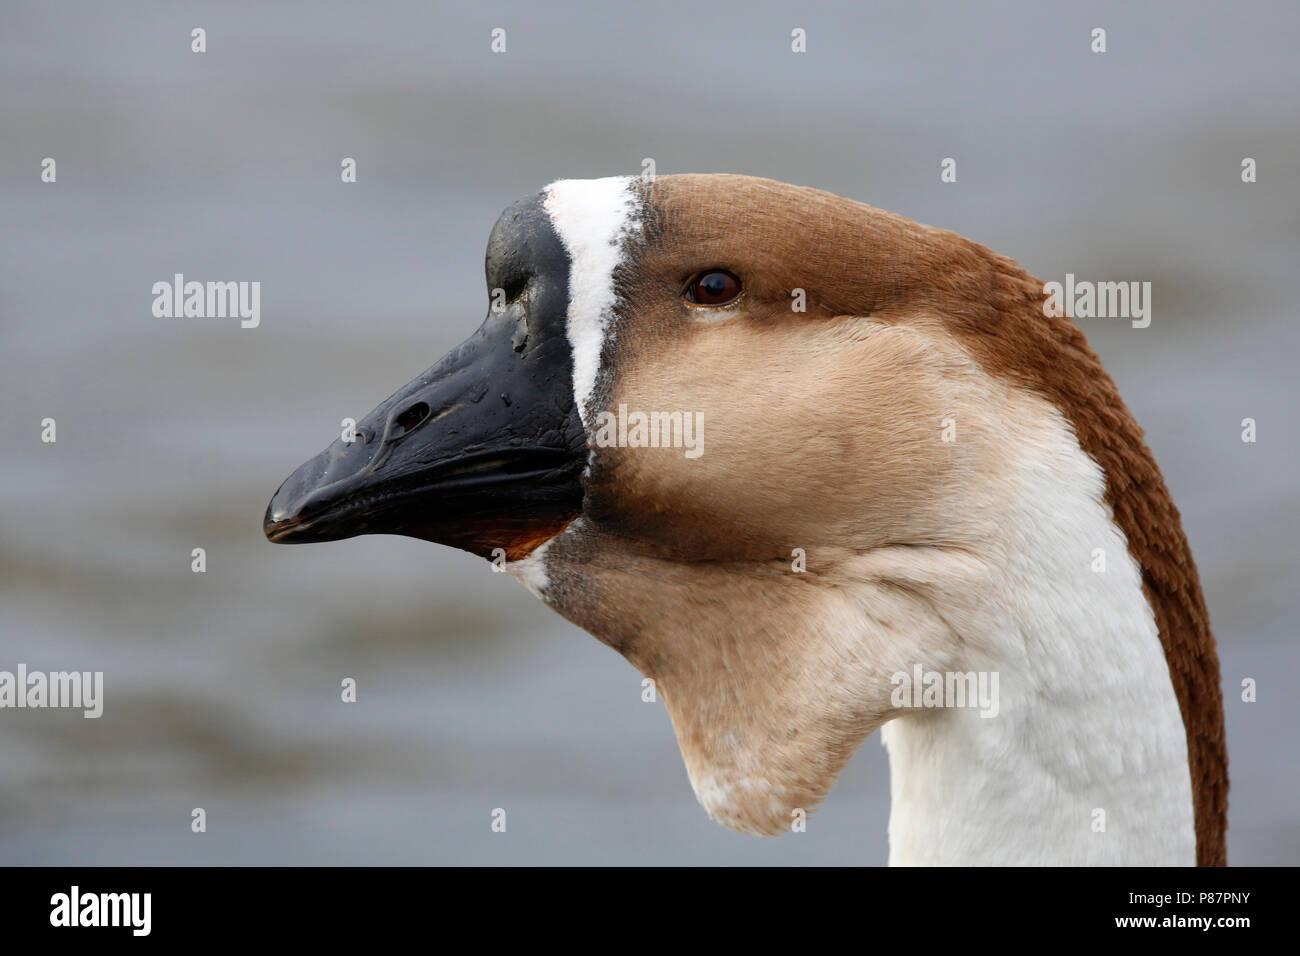 Portret soepgans; portret goose Immagini Stock